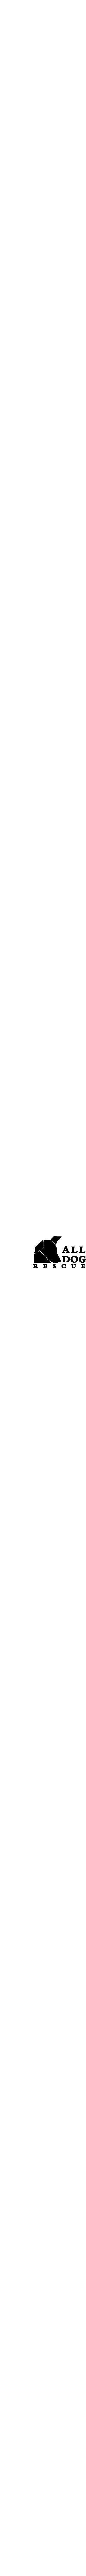 All Dog Rescue, Inc.